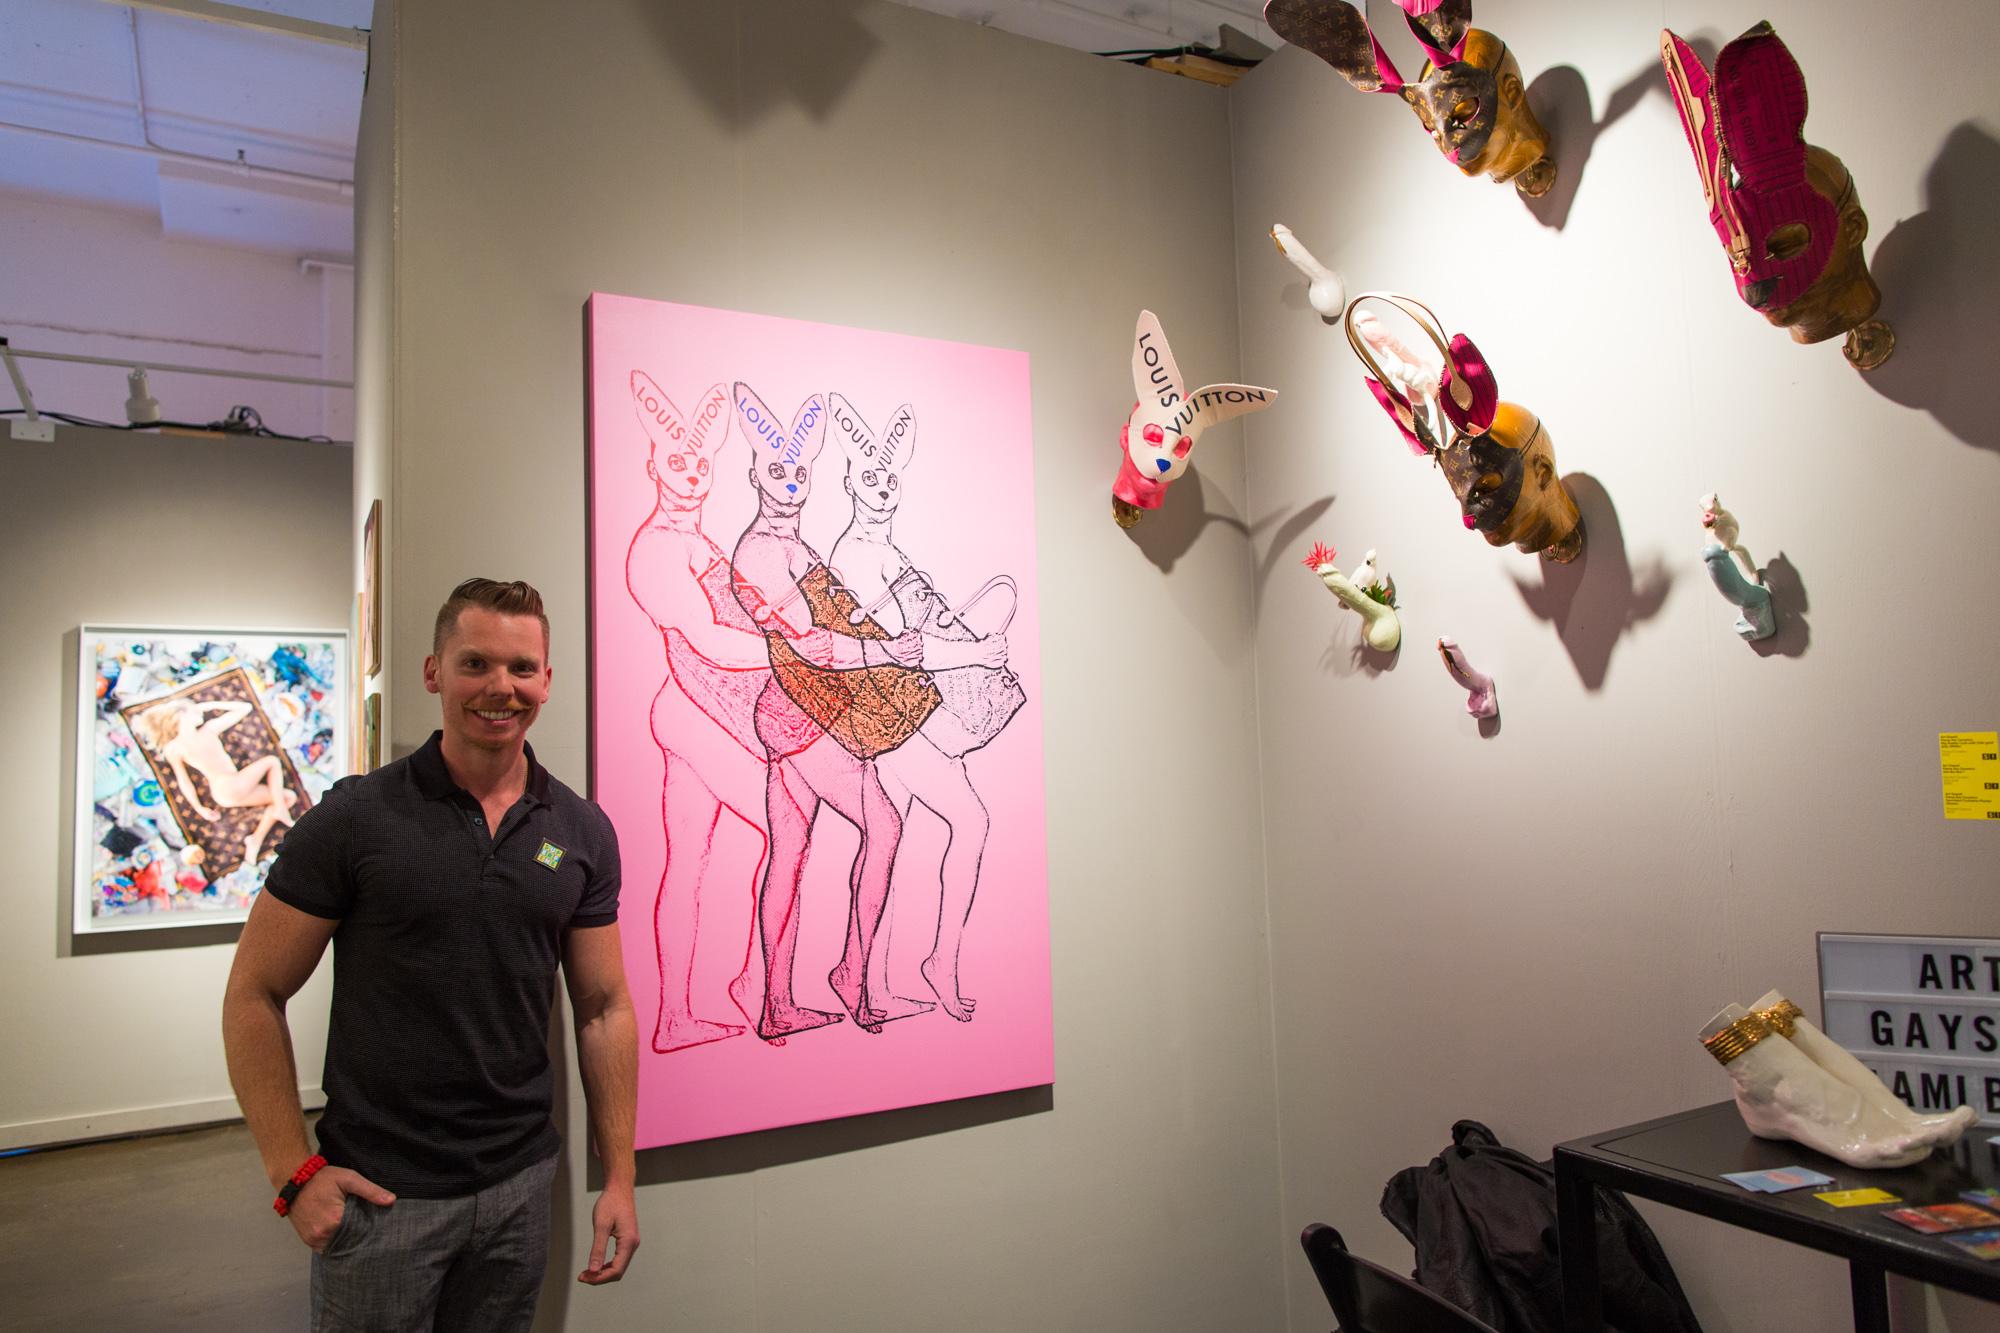 Alex Guerra in his Art Gaysel booth at Superfine! Art Fair in Chelsea, 2017.